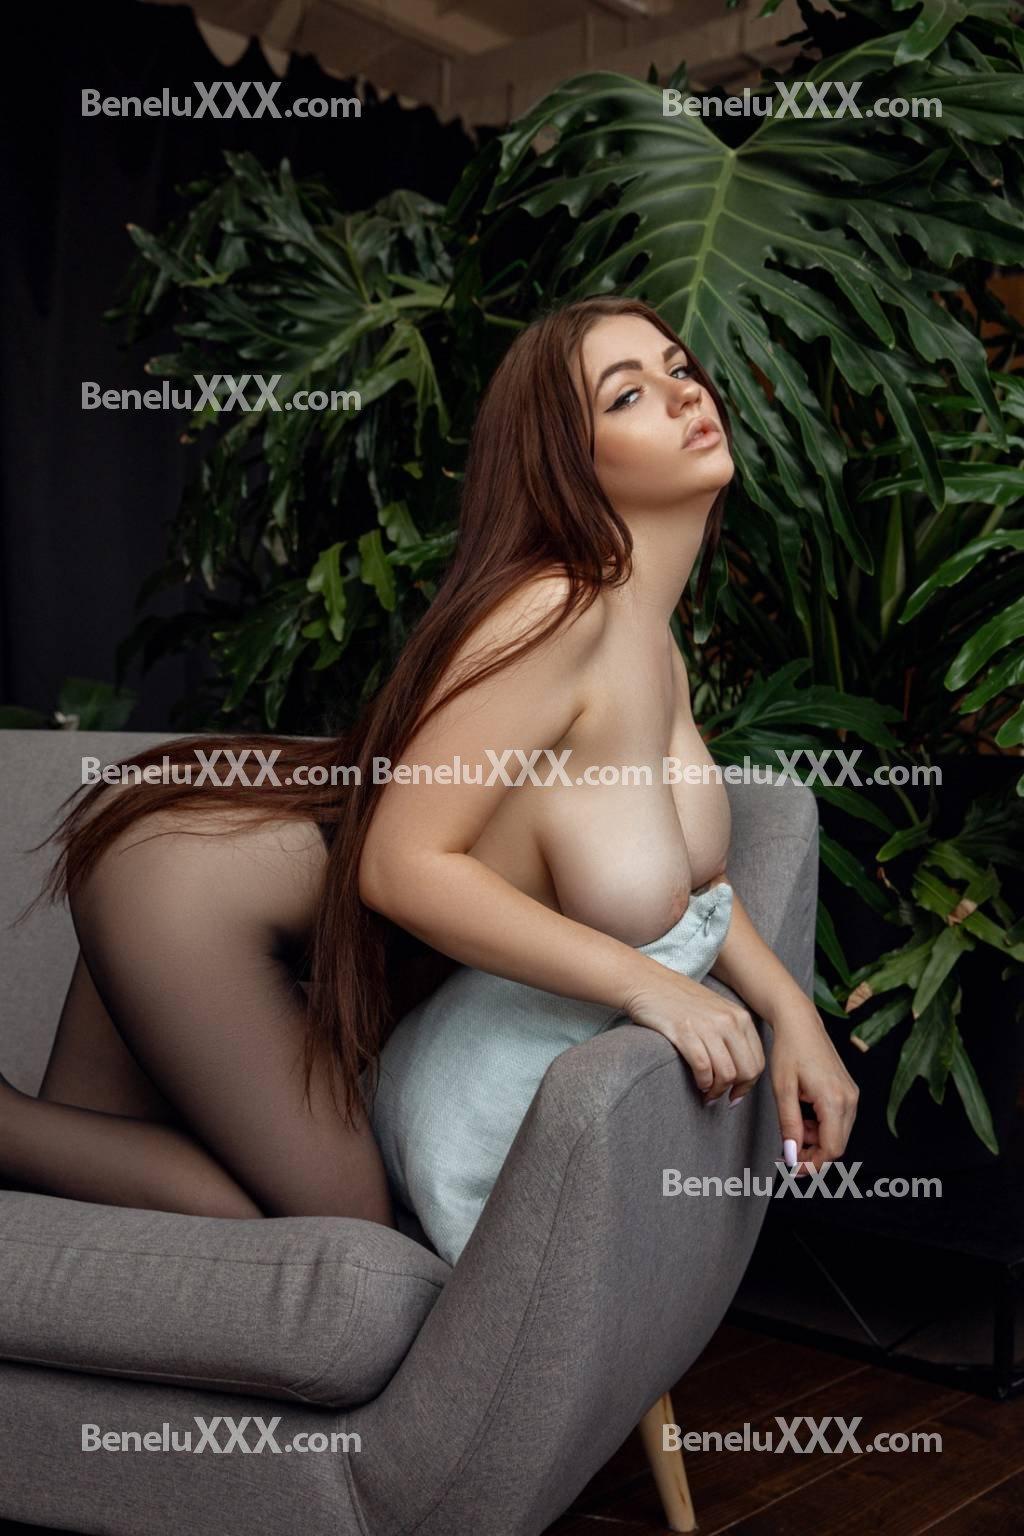 Daisy from BeneluXXX.com